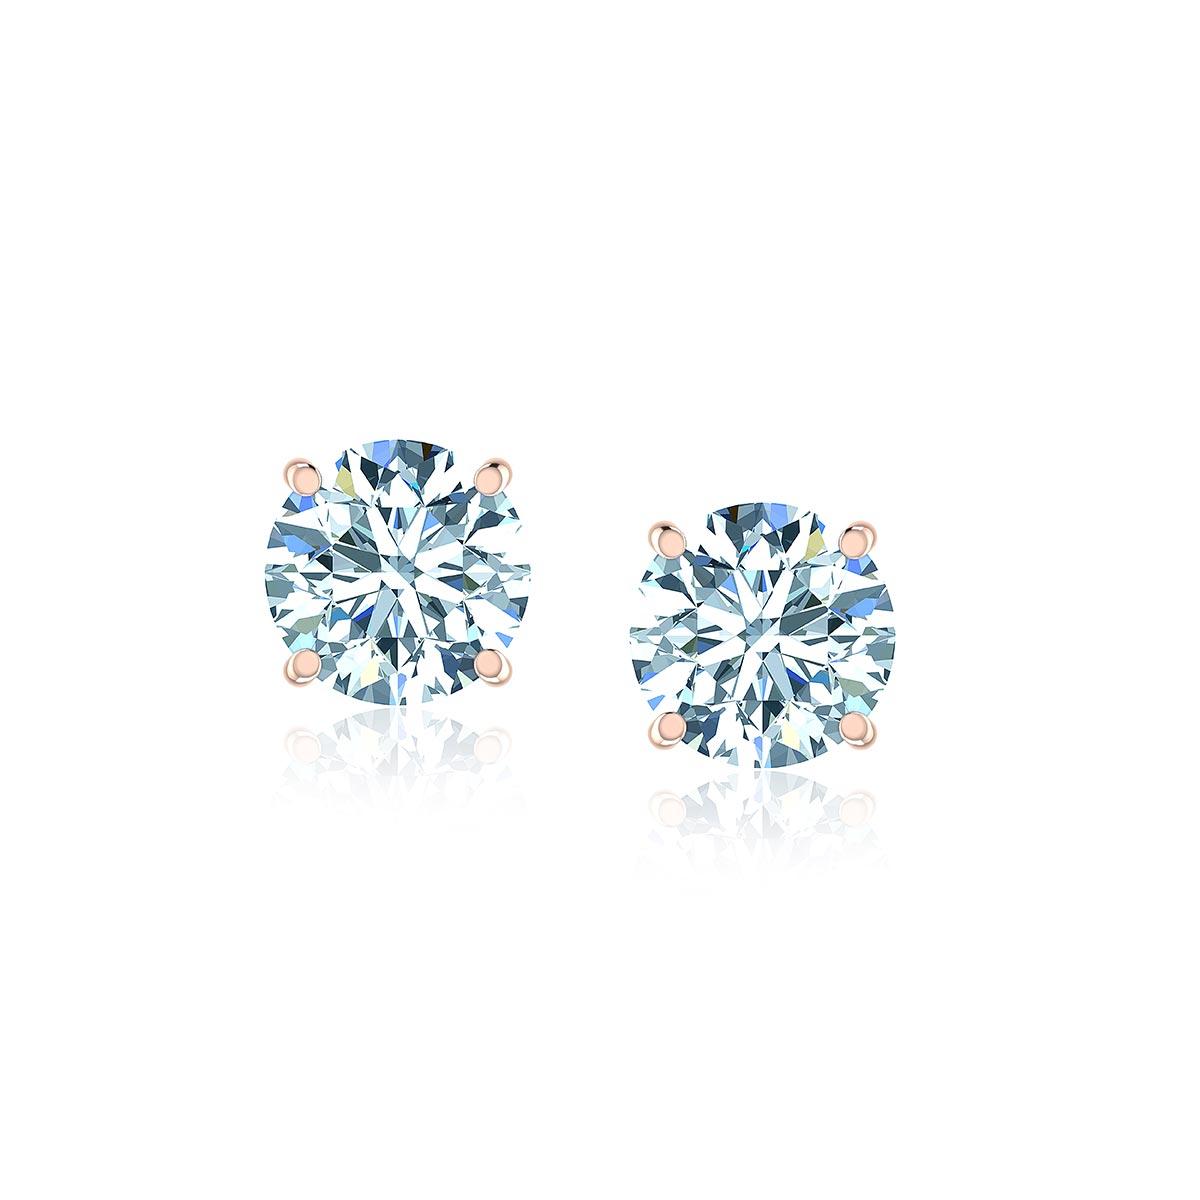 Tucana Diamond Earrings (1 CT. TW.)